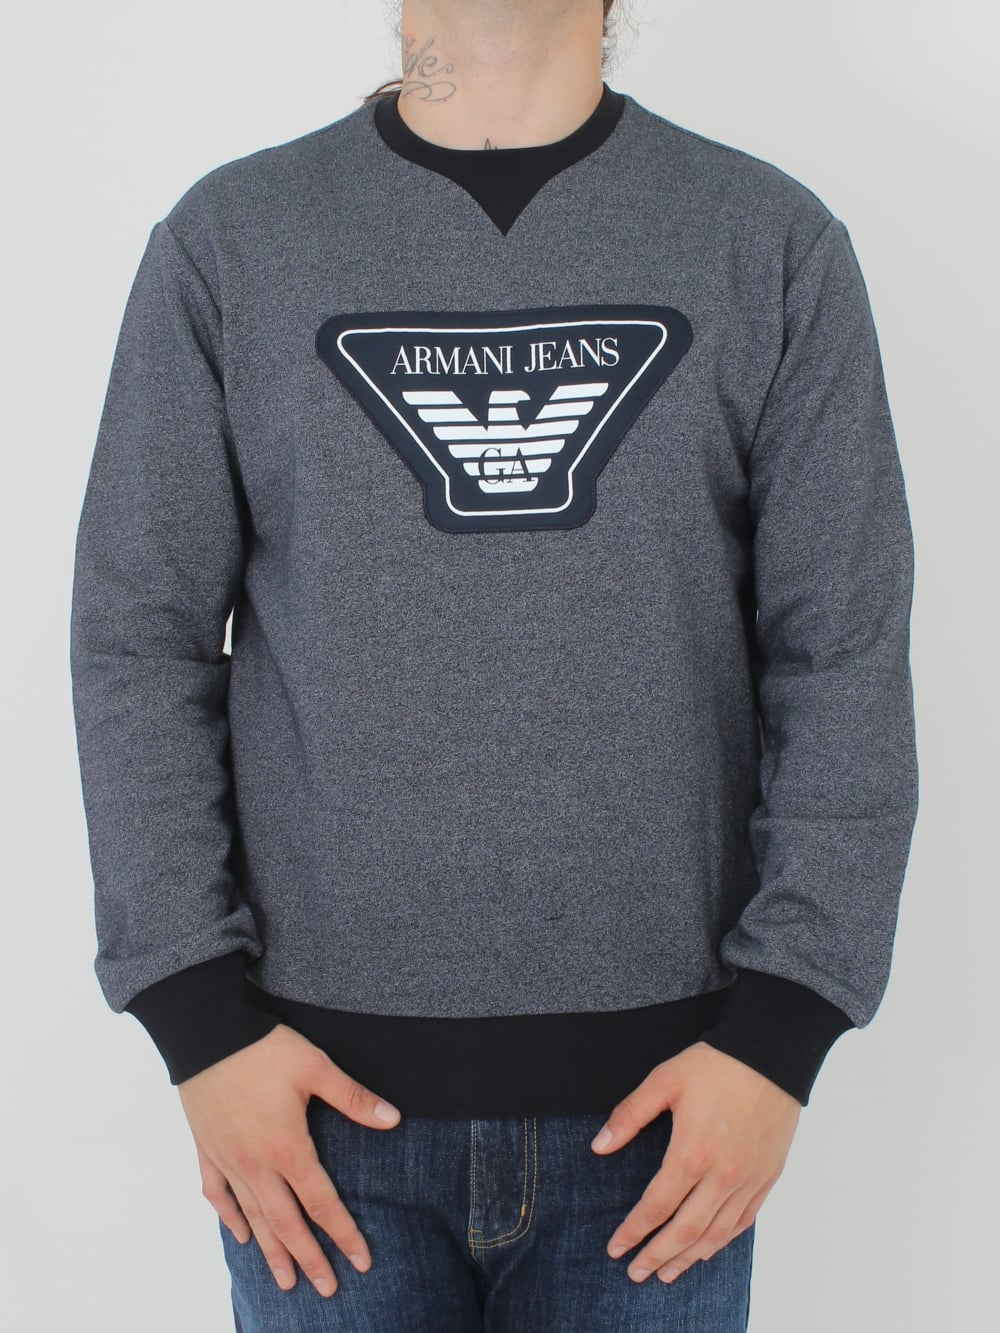 Armani Jeans Oversized Logo Crew Neck Sweat in Navy - Northern Threads 6a9da4637cbf